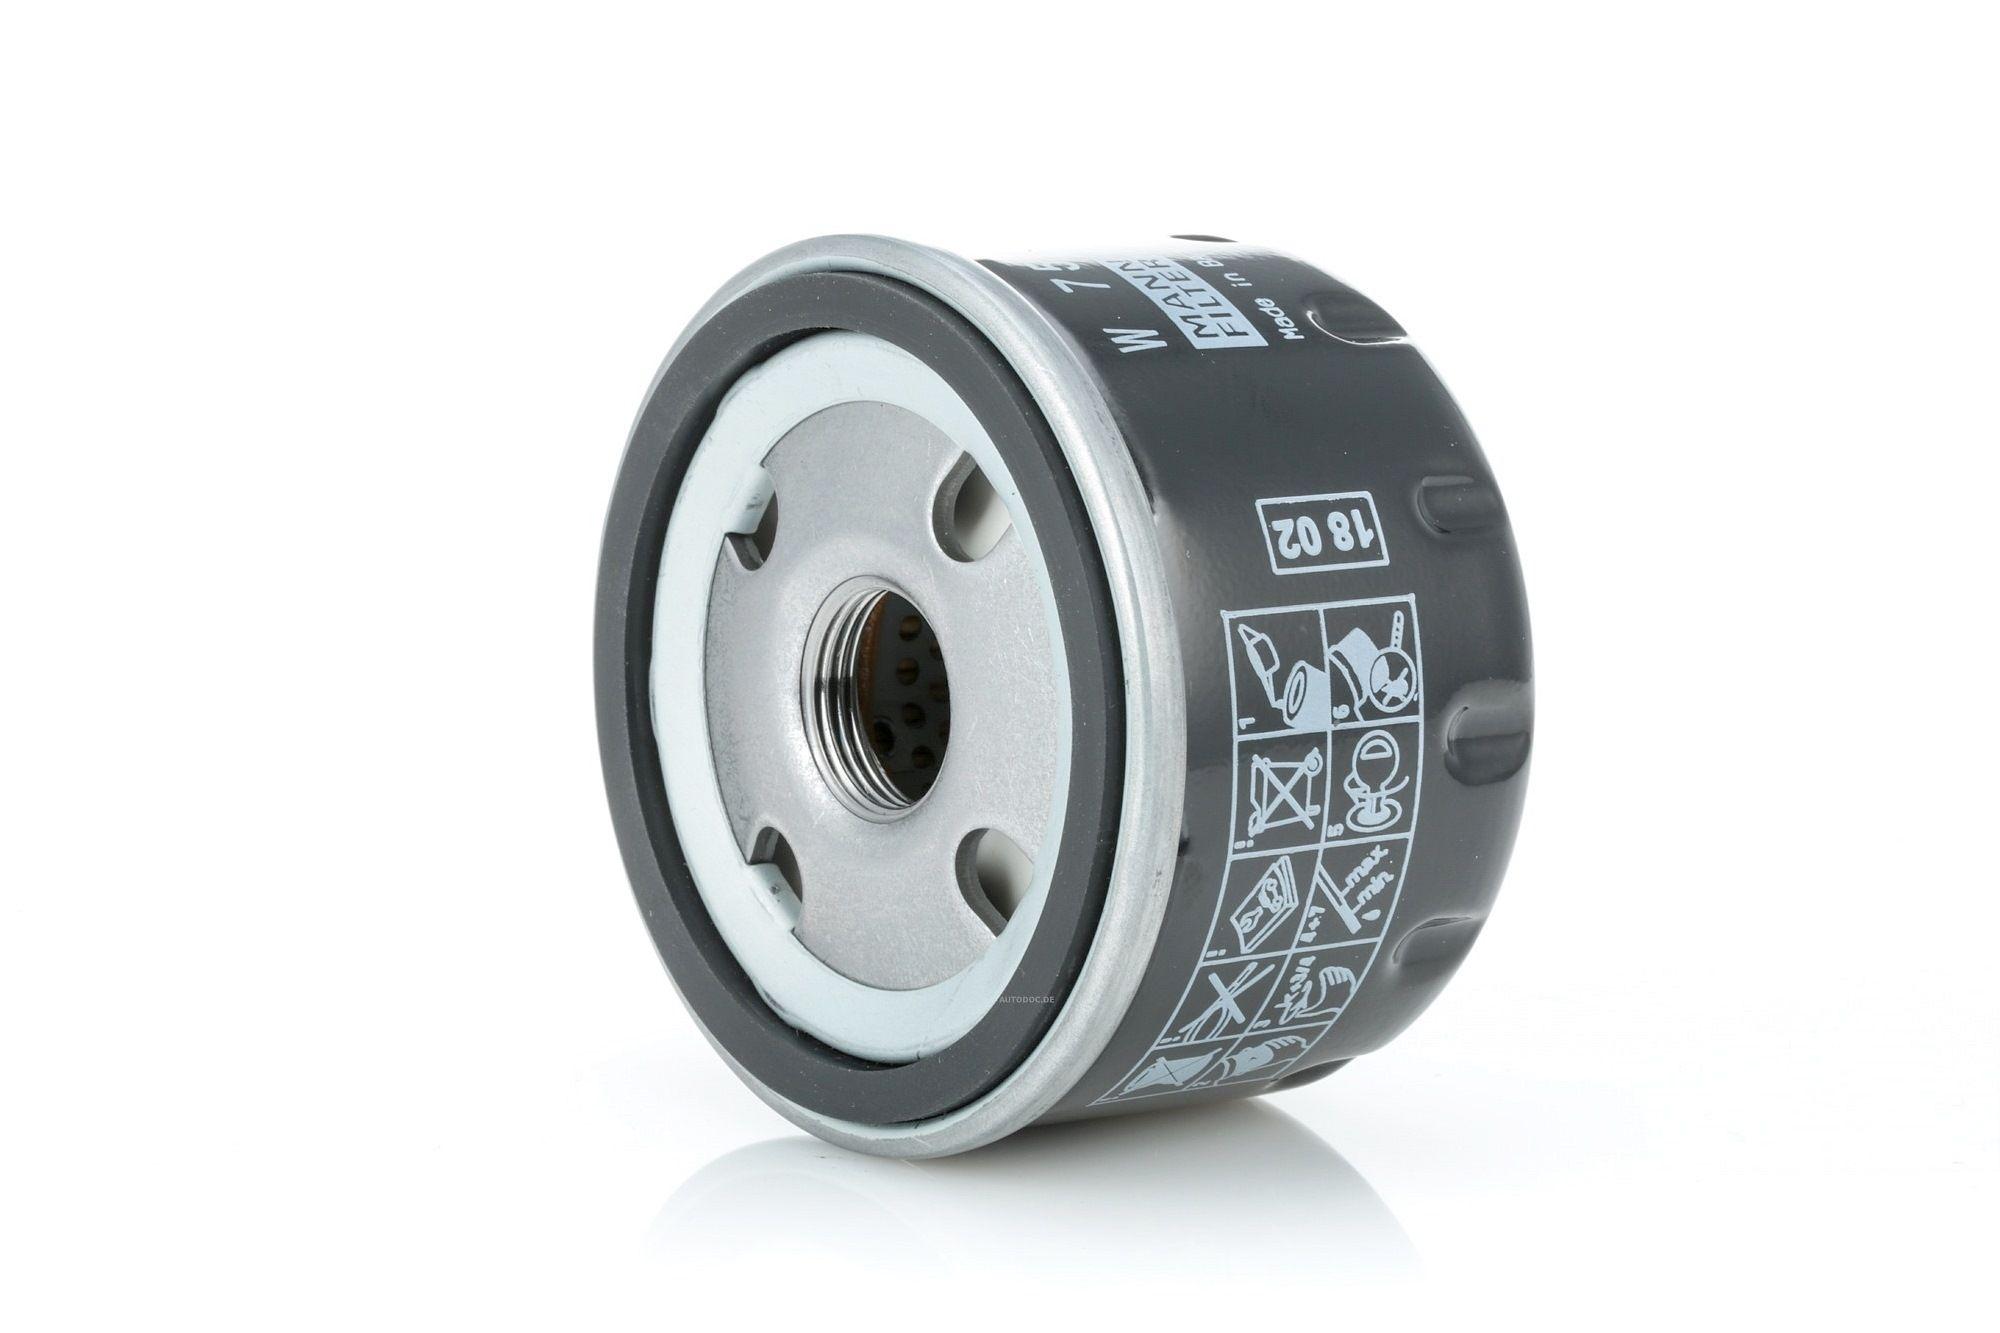 W 75/3 MANN-FILTER Opschroeffilter, Met een terugloopbeveiligingskleppen Binnendiameter 2: 62mm, Ø: 76mm, Buitendiameter 2: 71mm, Hoogte: 50mm Oliefilter W 75/3 koop goedkoop